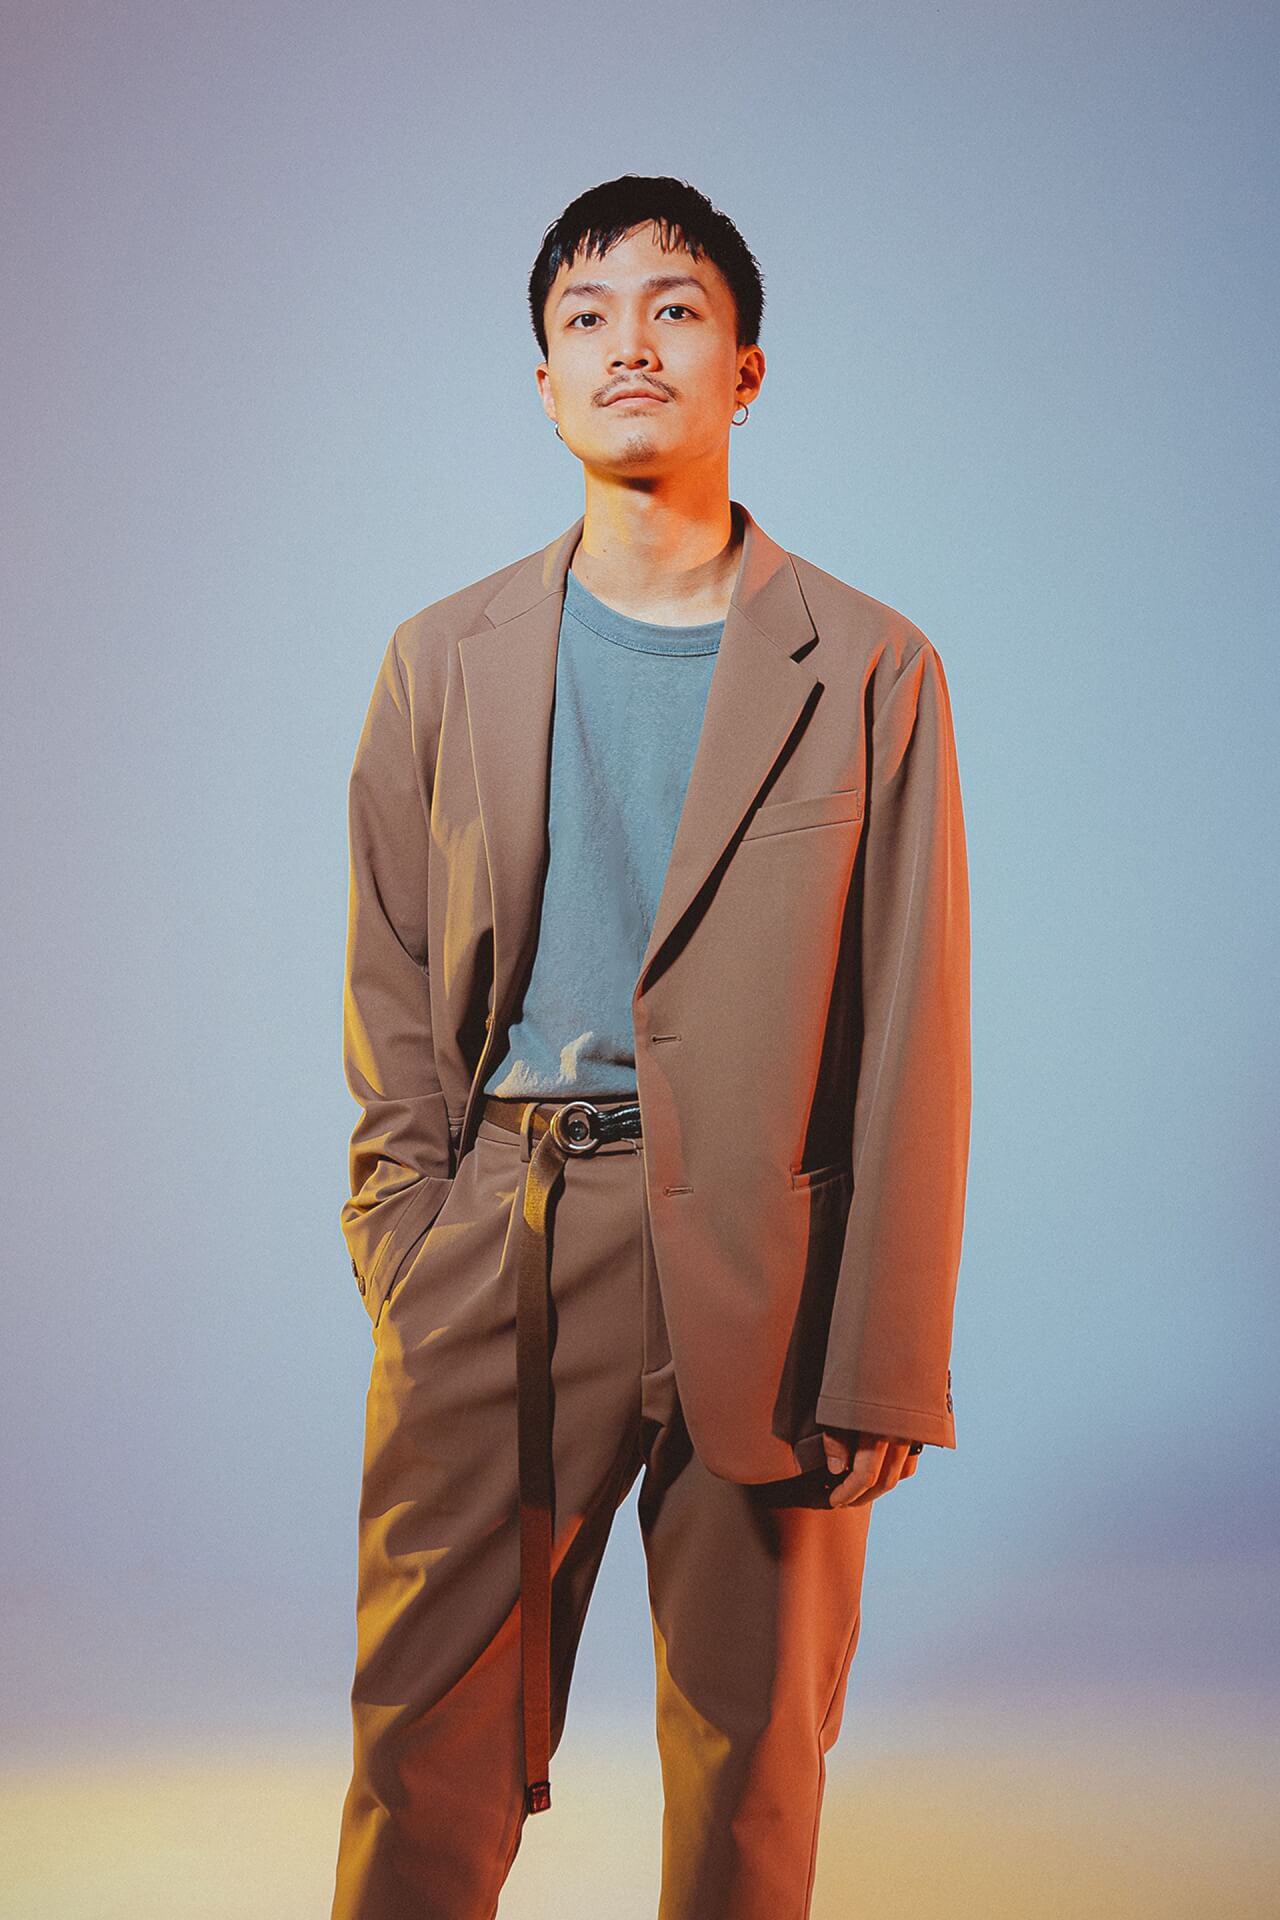 80KIDZがShin Sakiuraとの共作も収録の新作EP『RAW WNDS MIXTAPE #003』を配信&数量限定カセットテープでリリース! music200814_80kidz_03-1